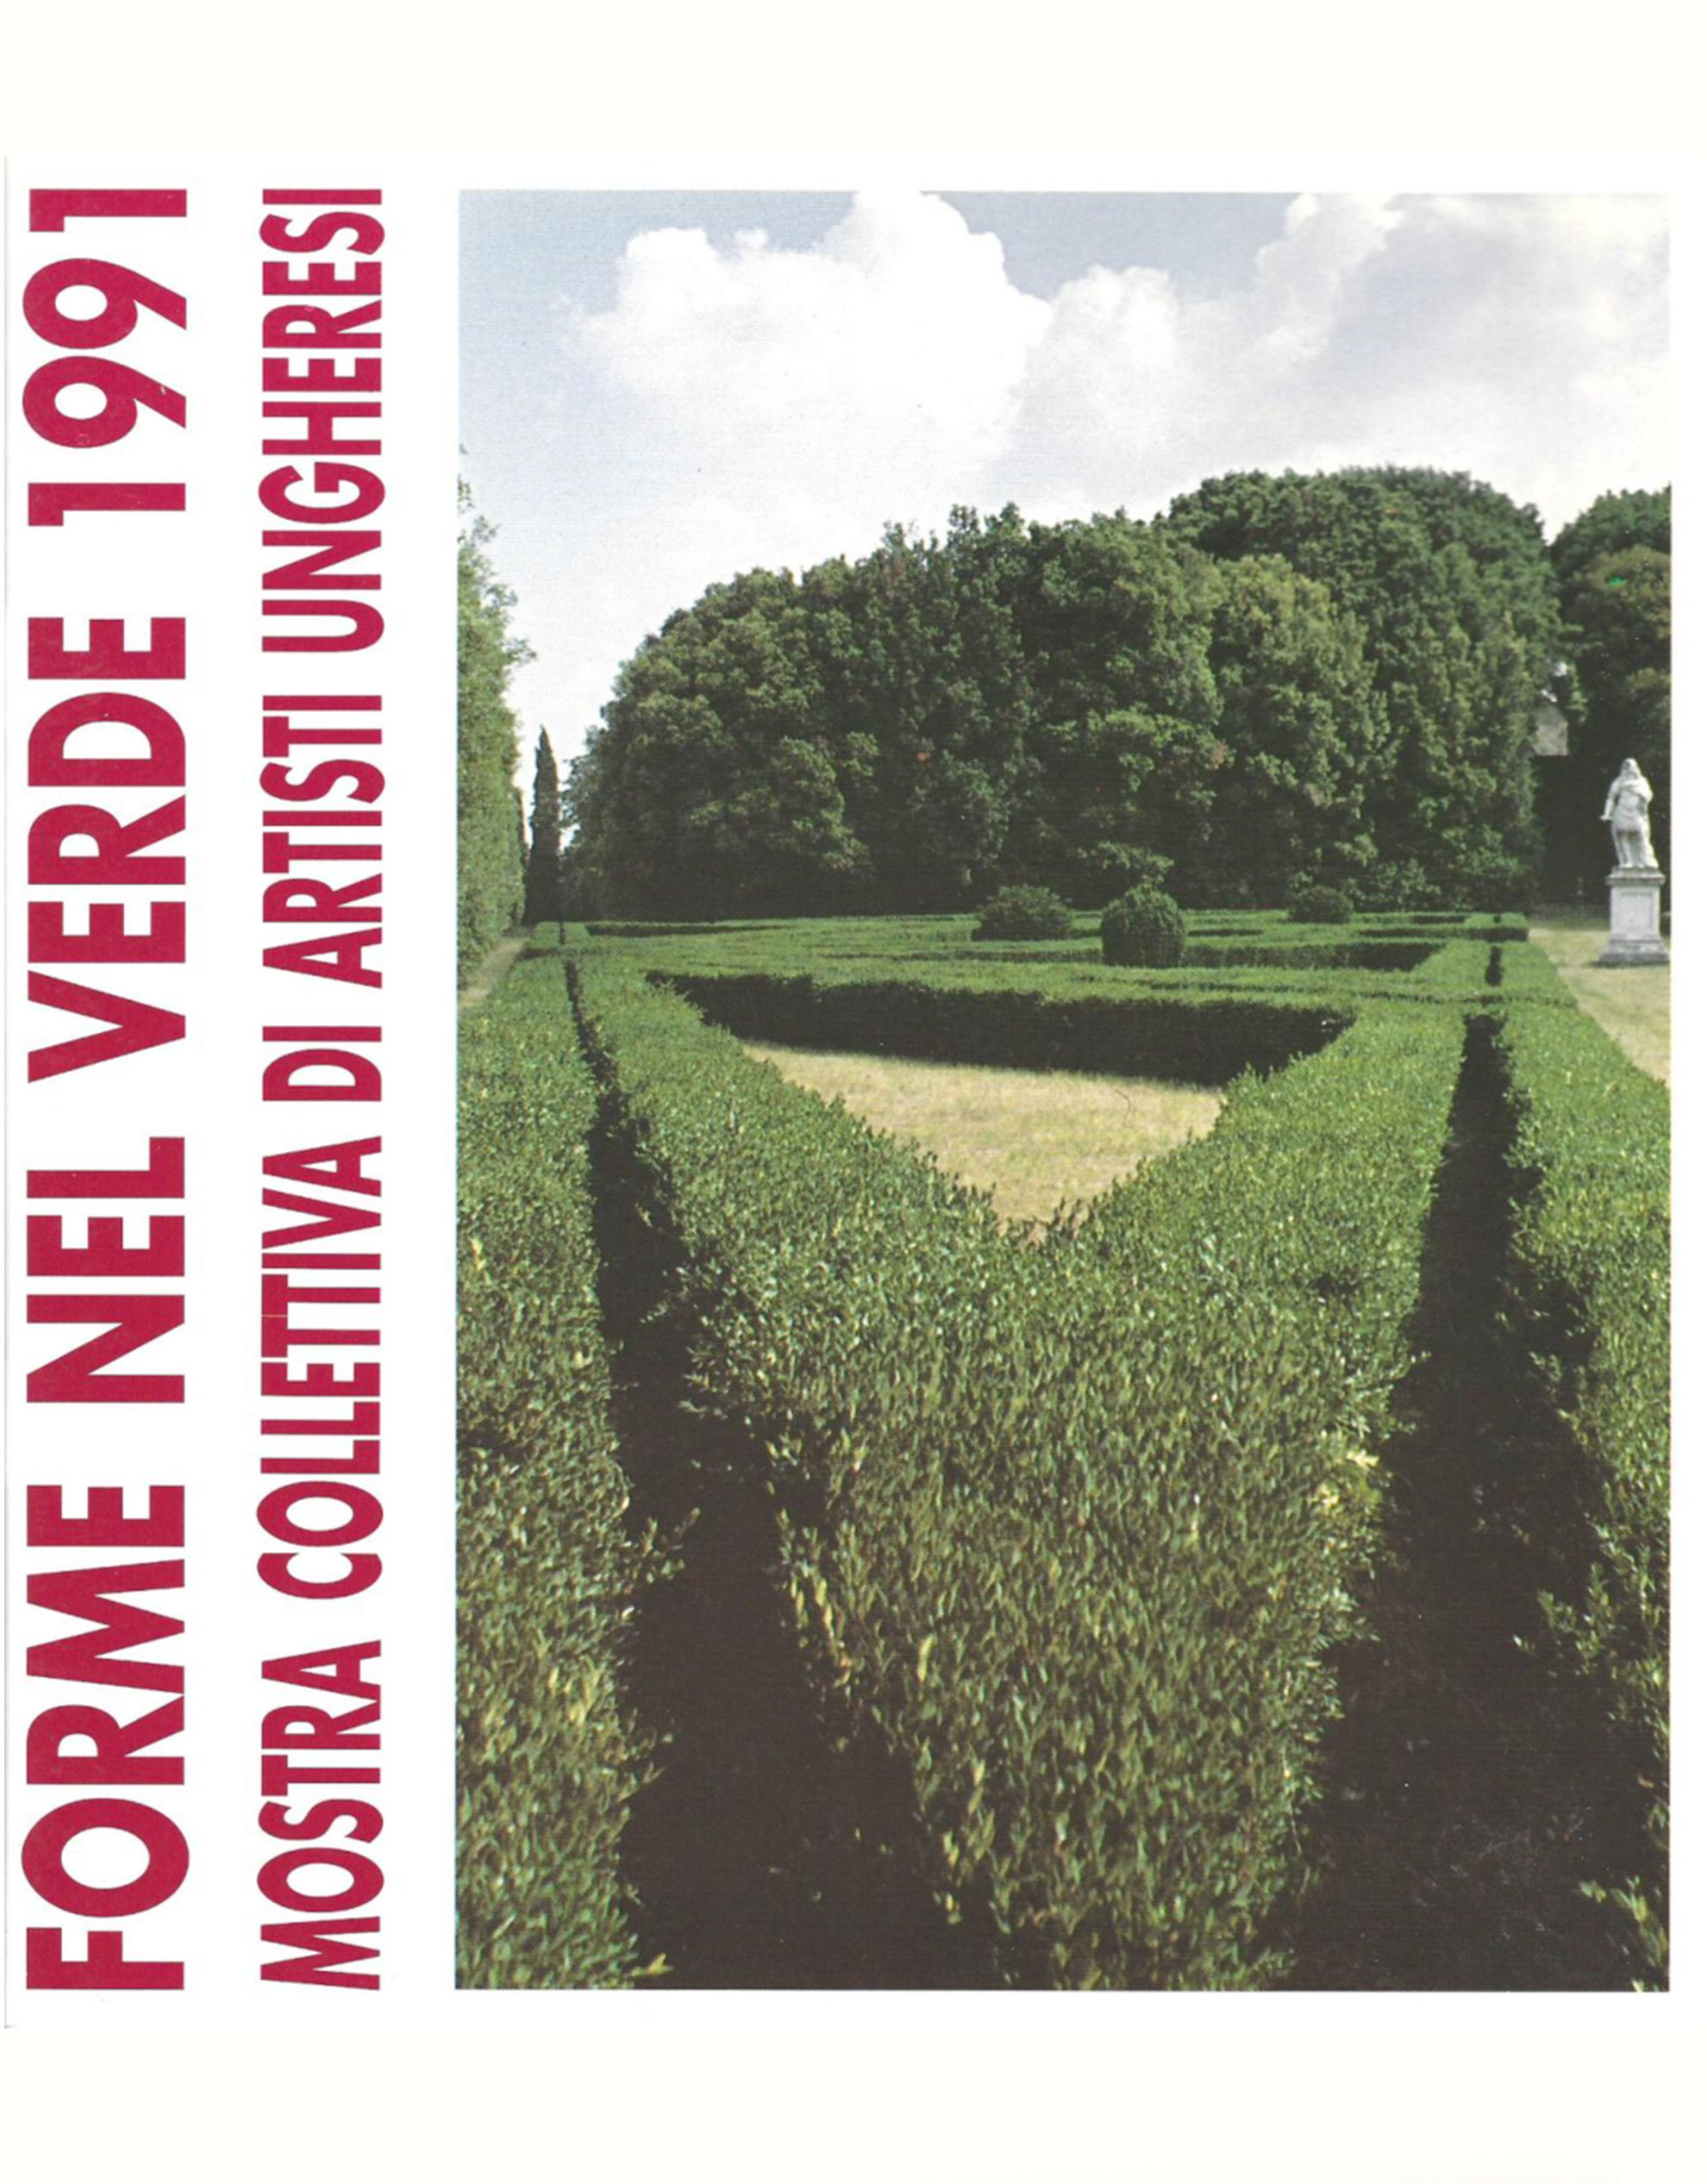 Catalogo Forme nel Verde 1991